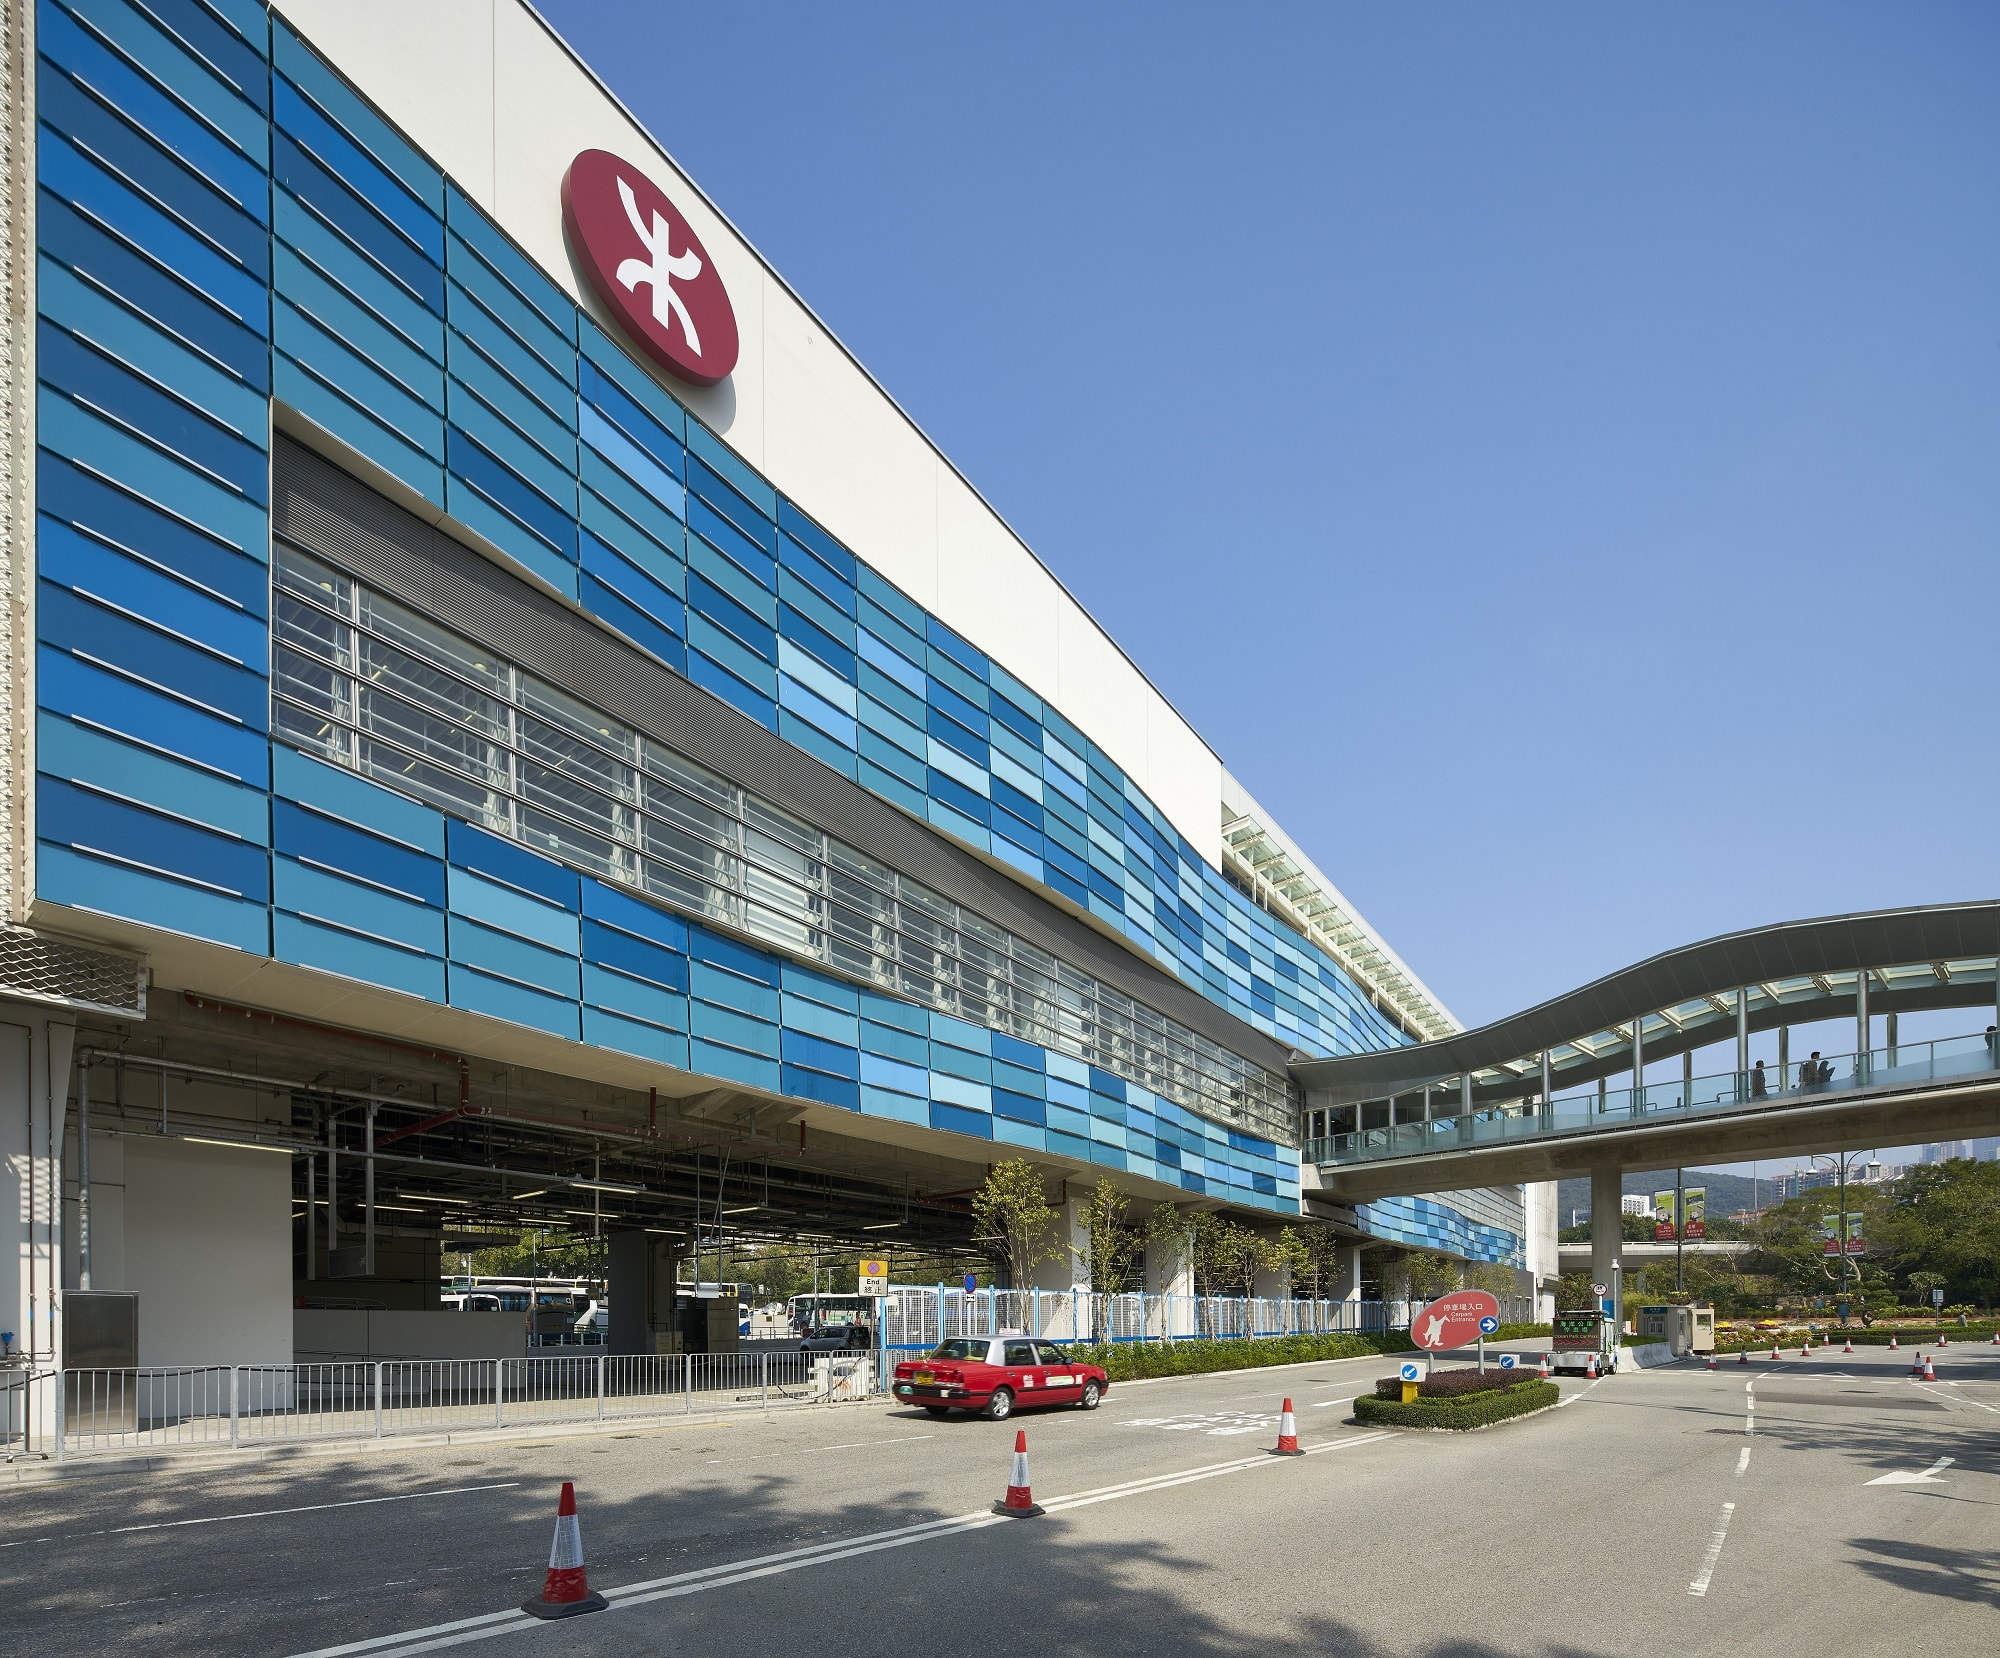 Aedas · More Aedas-designed infrastructure projects begin